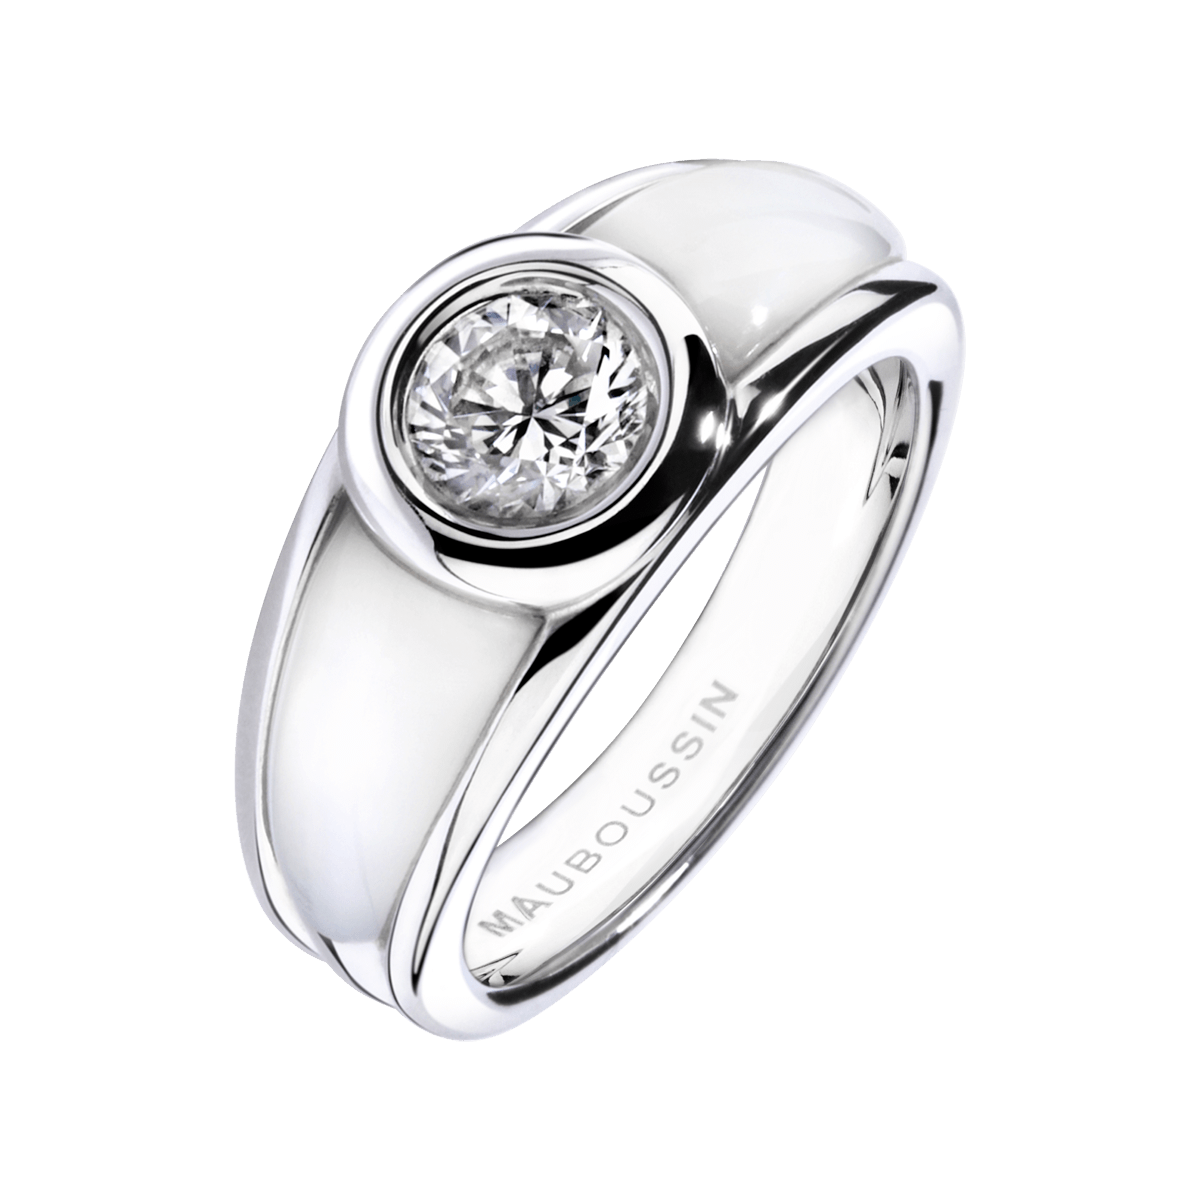 Top Bague Nadia or blanc, diamant, nacre blanche - Mauboussin | Ile  FT34